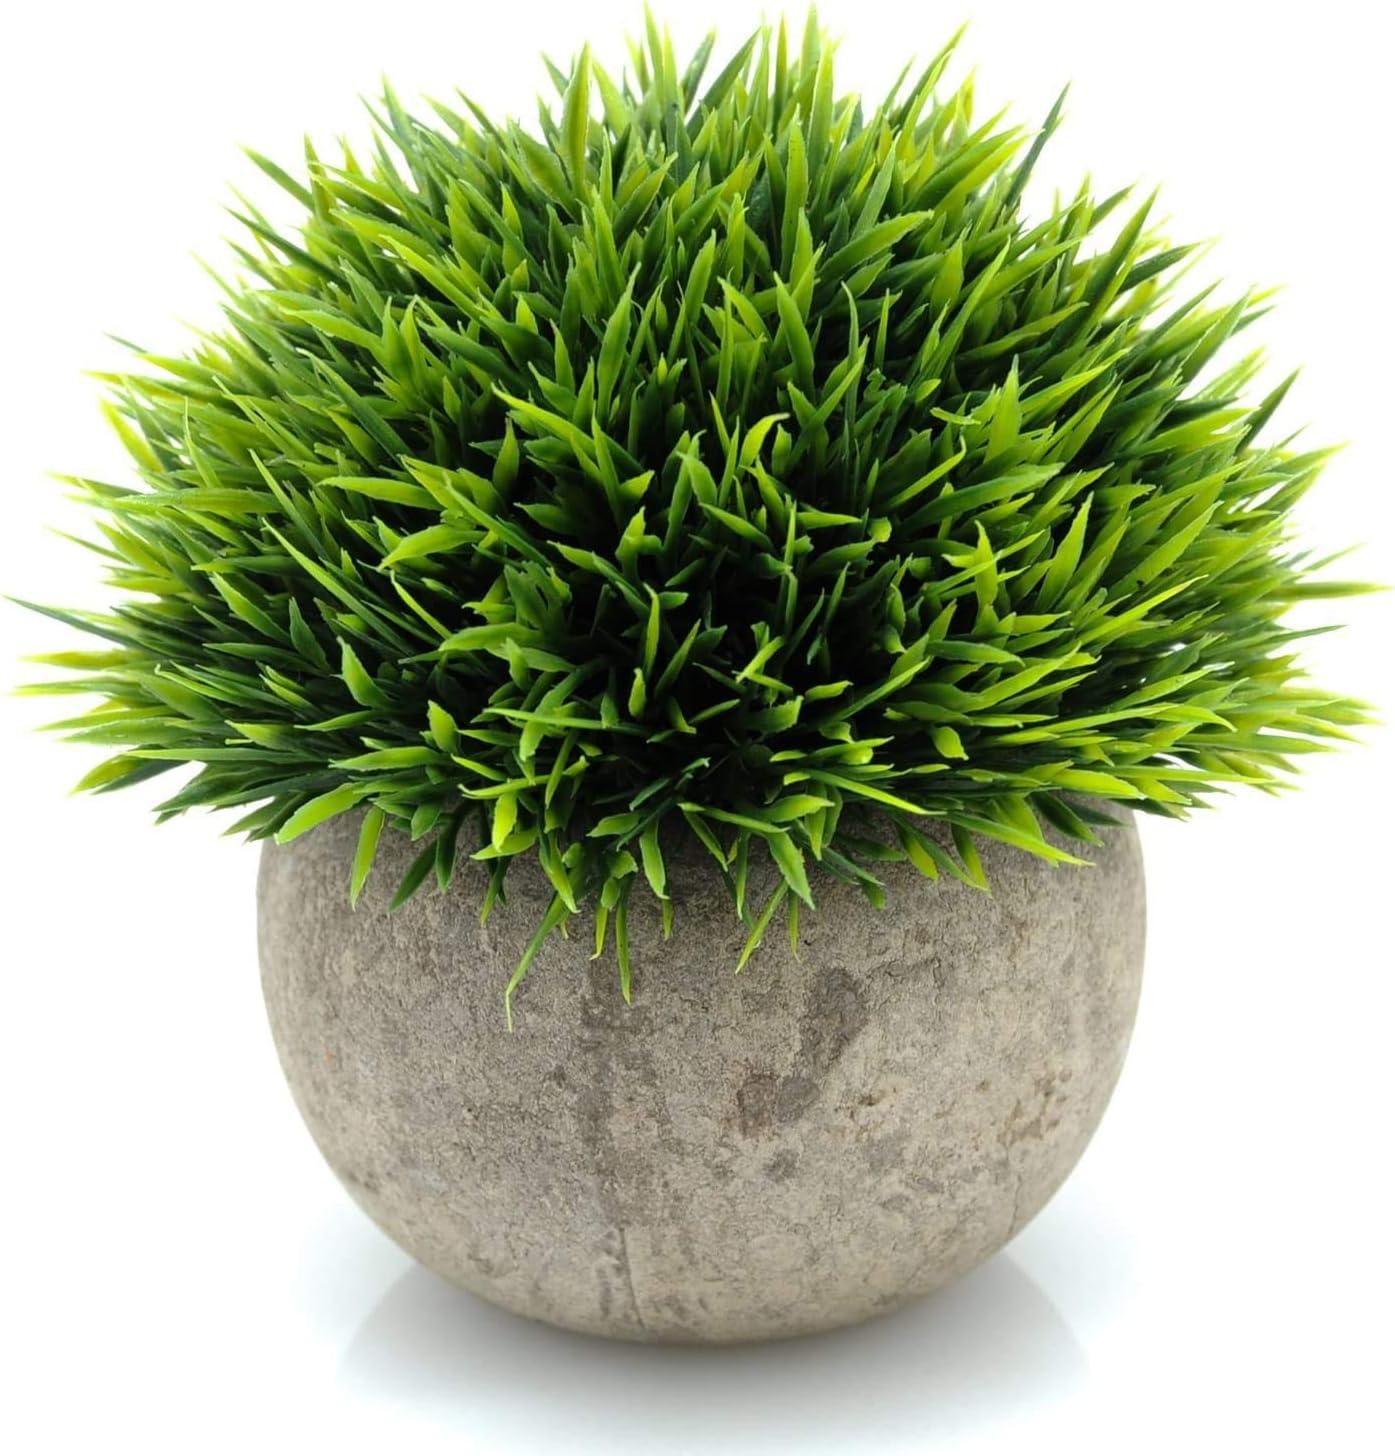 Velener Mini Plastic Fake Green Grass Plants with Pots for Home Decor Indoor -